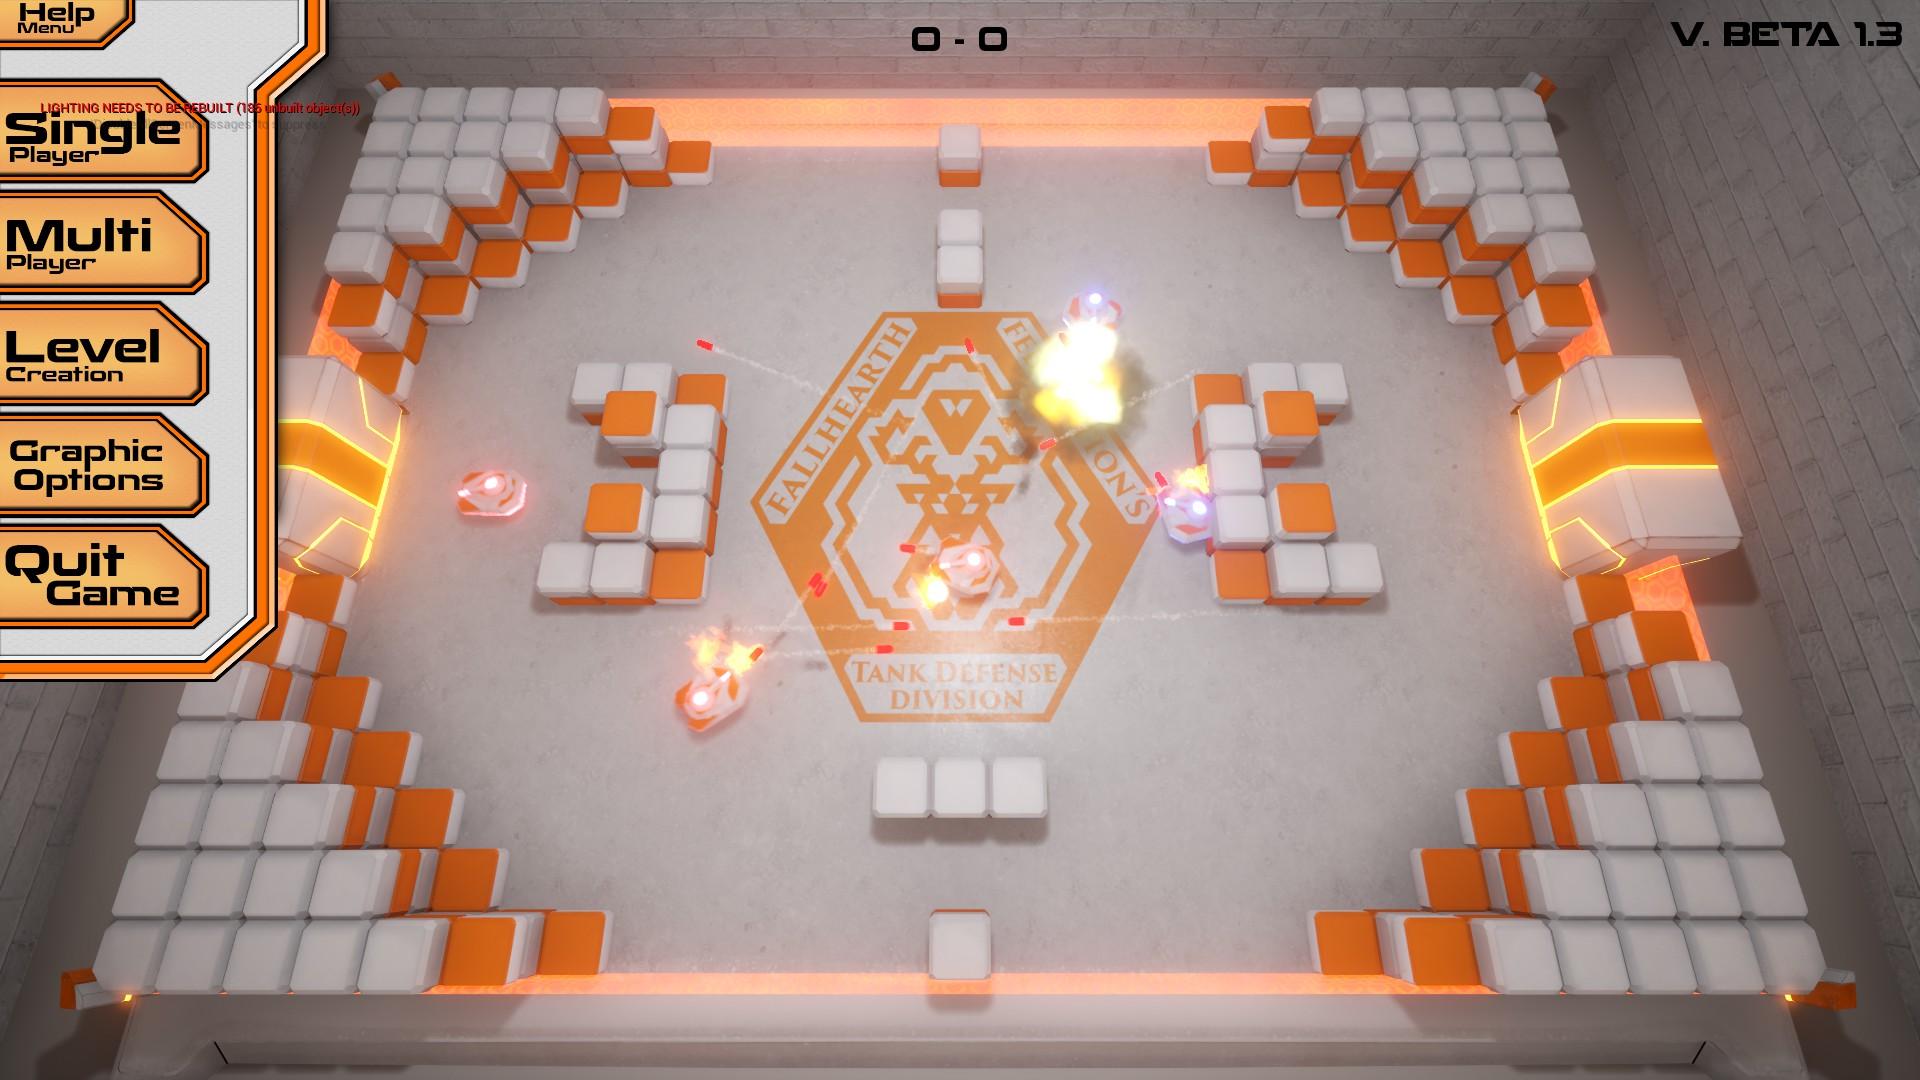 Tank Defense Division Screenshot 1